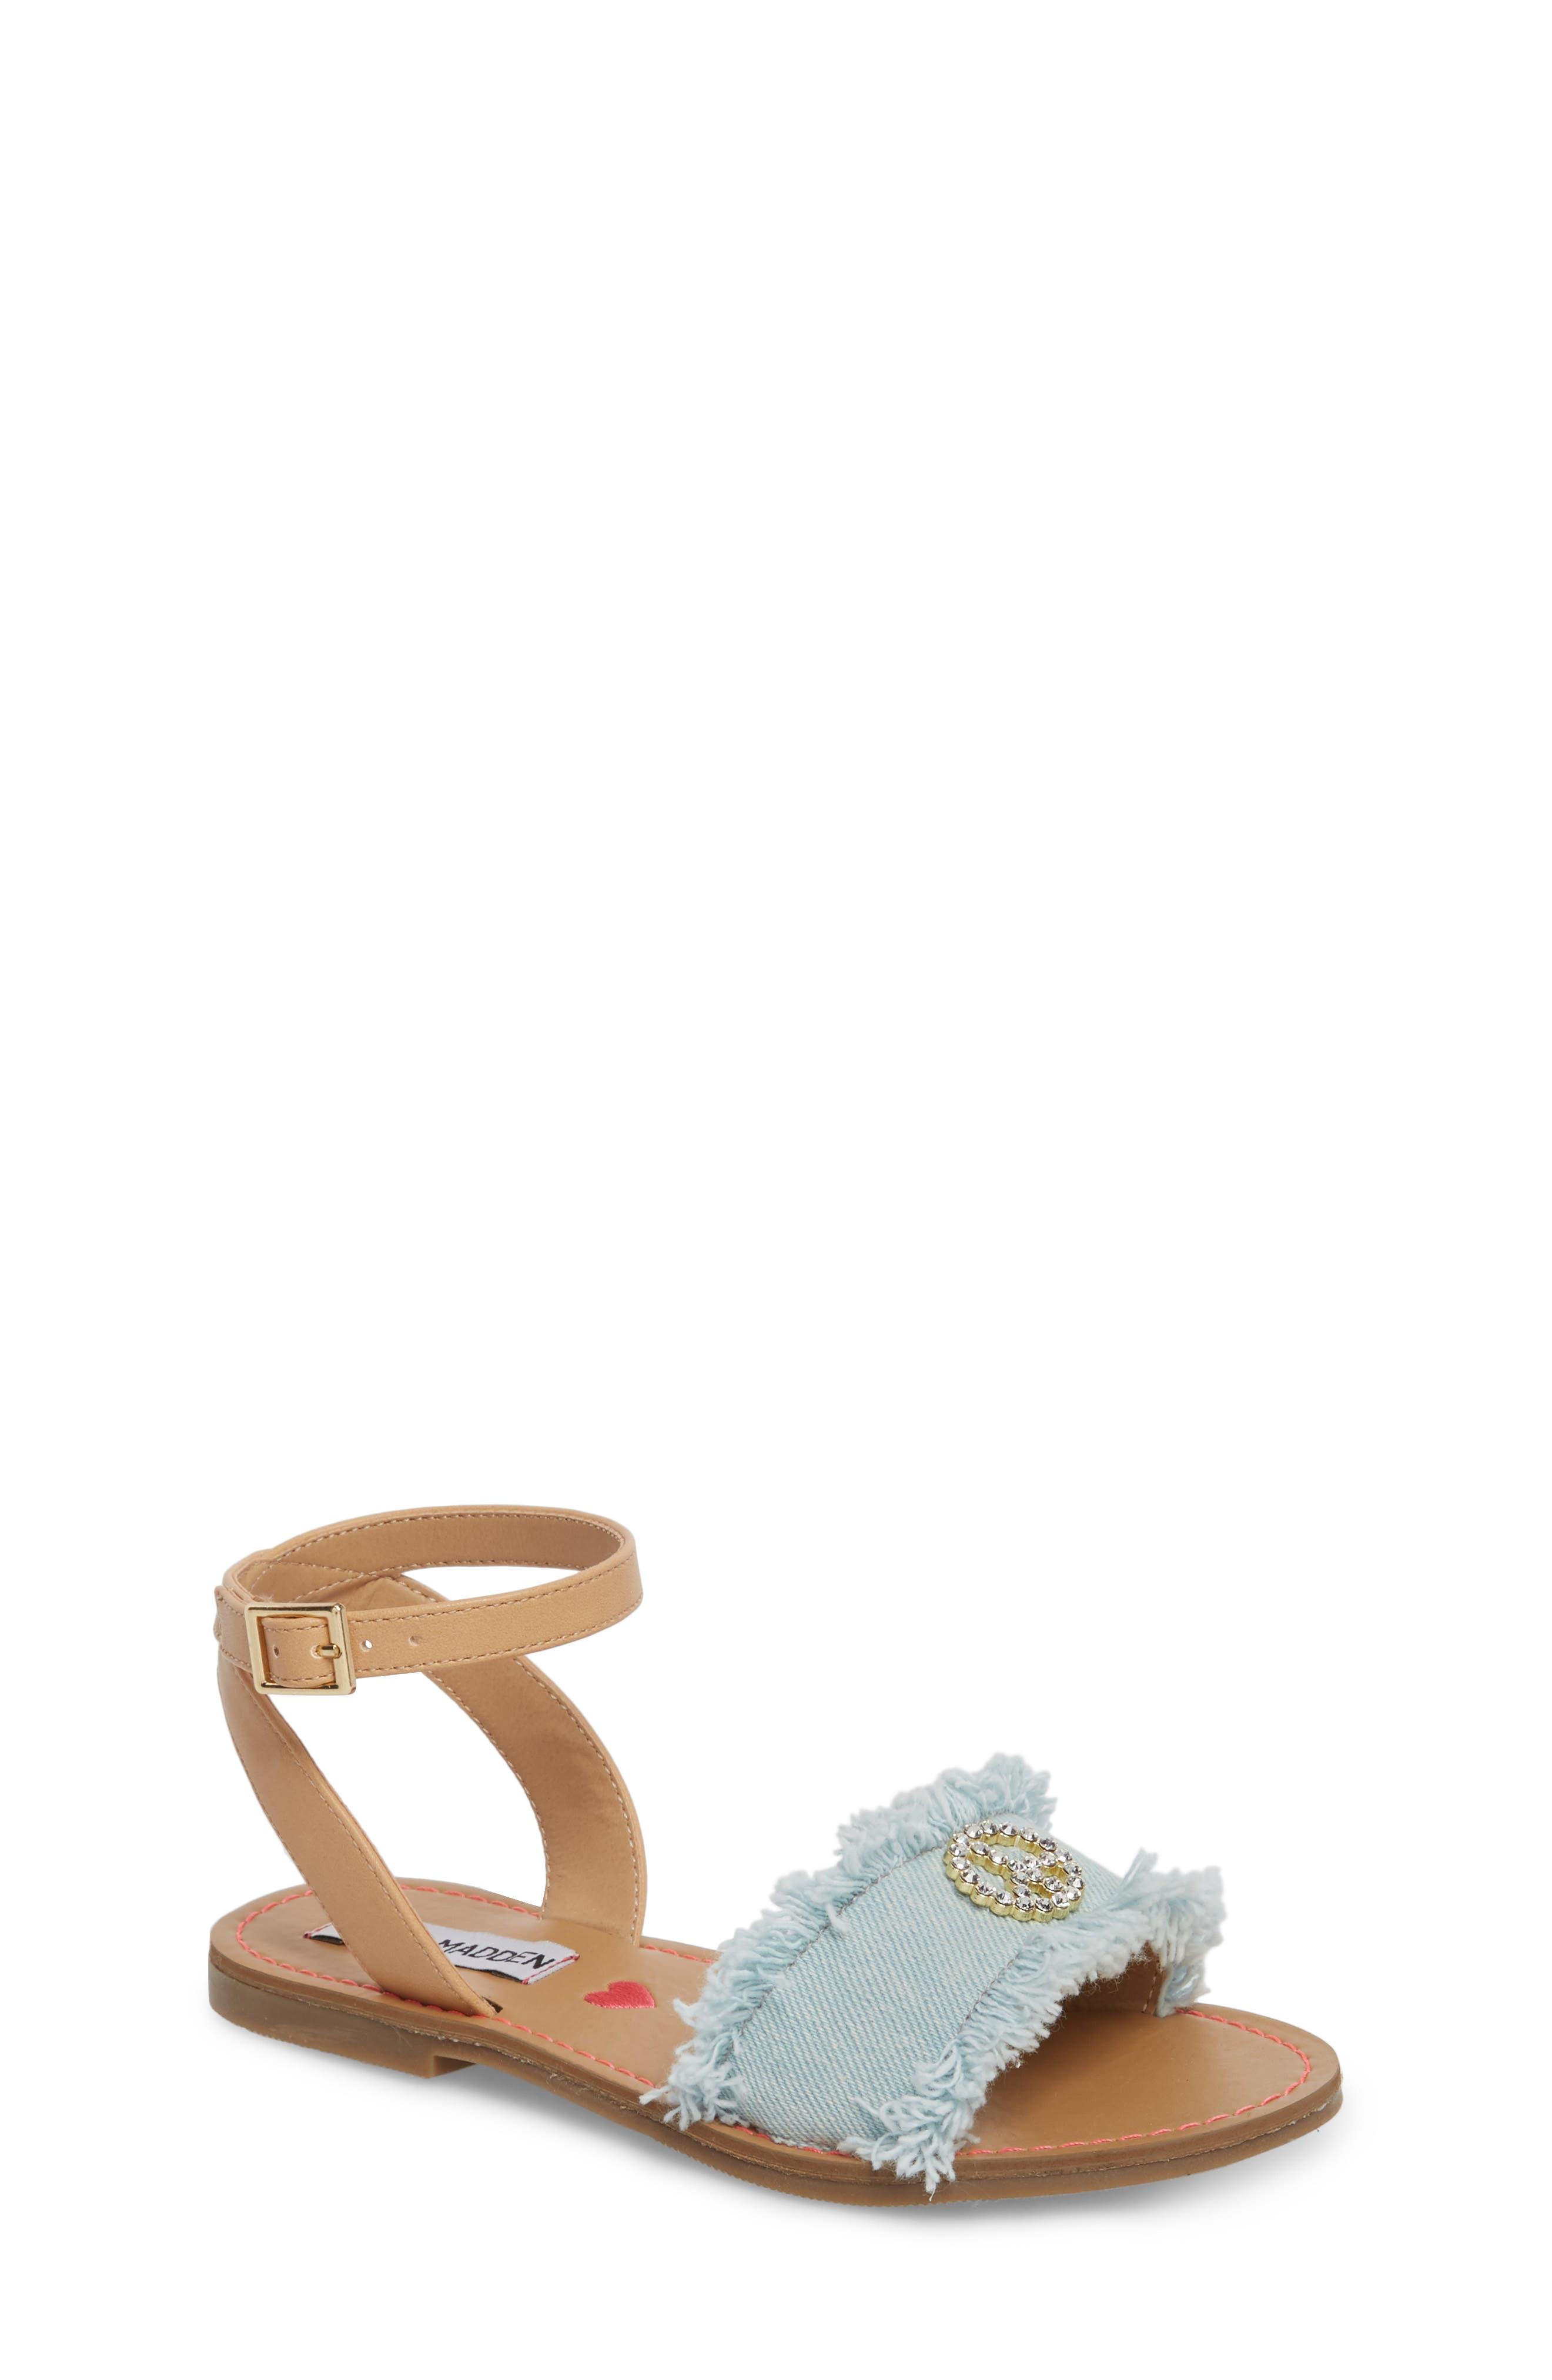 JVILLA Ankle Strap Sandal,                             Main thumbnail 1, color,                             401